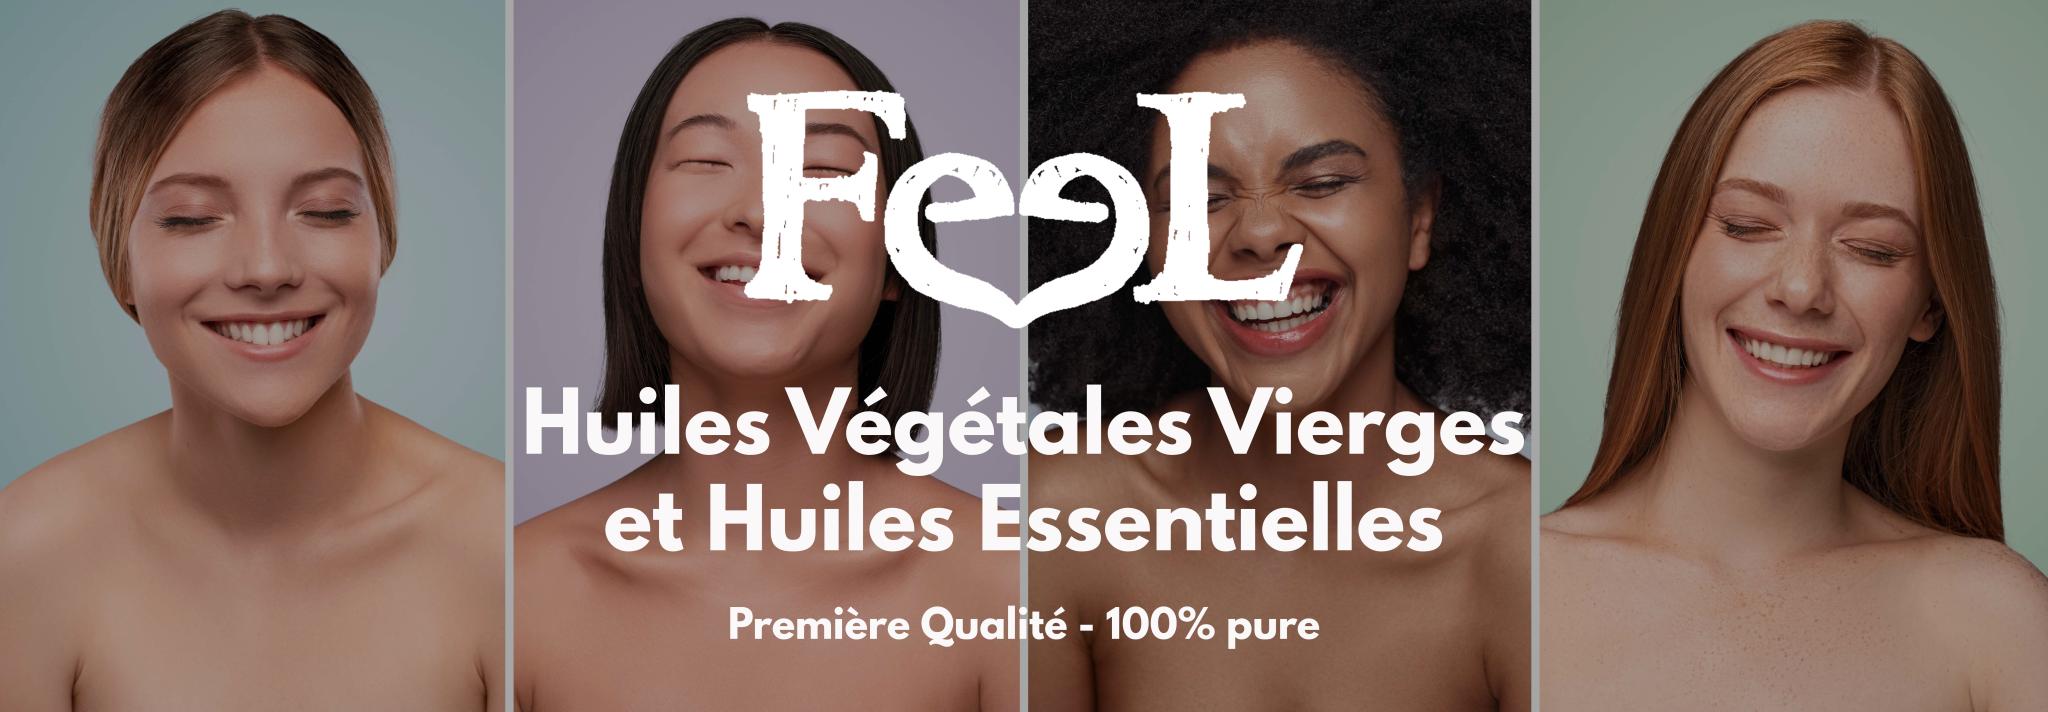 Feel Oil - Huiles vegetales vierge huiles essentielles Argiles Diffuseursd